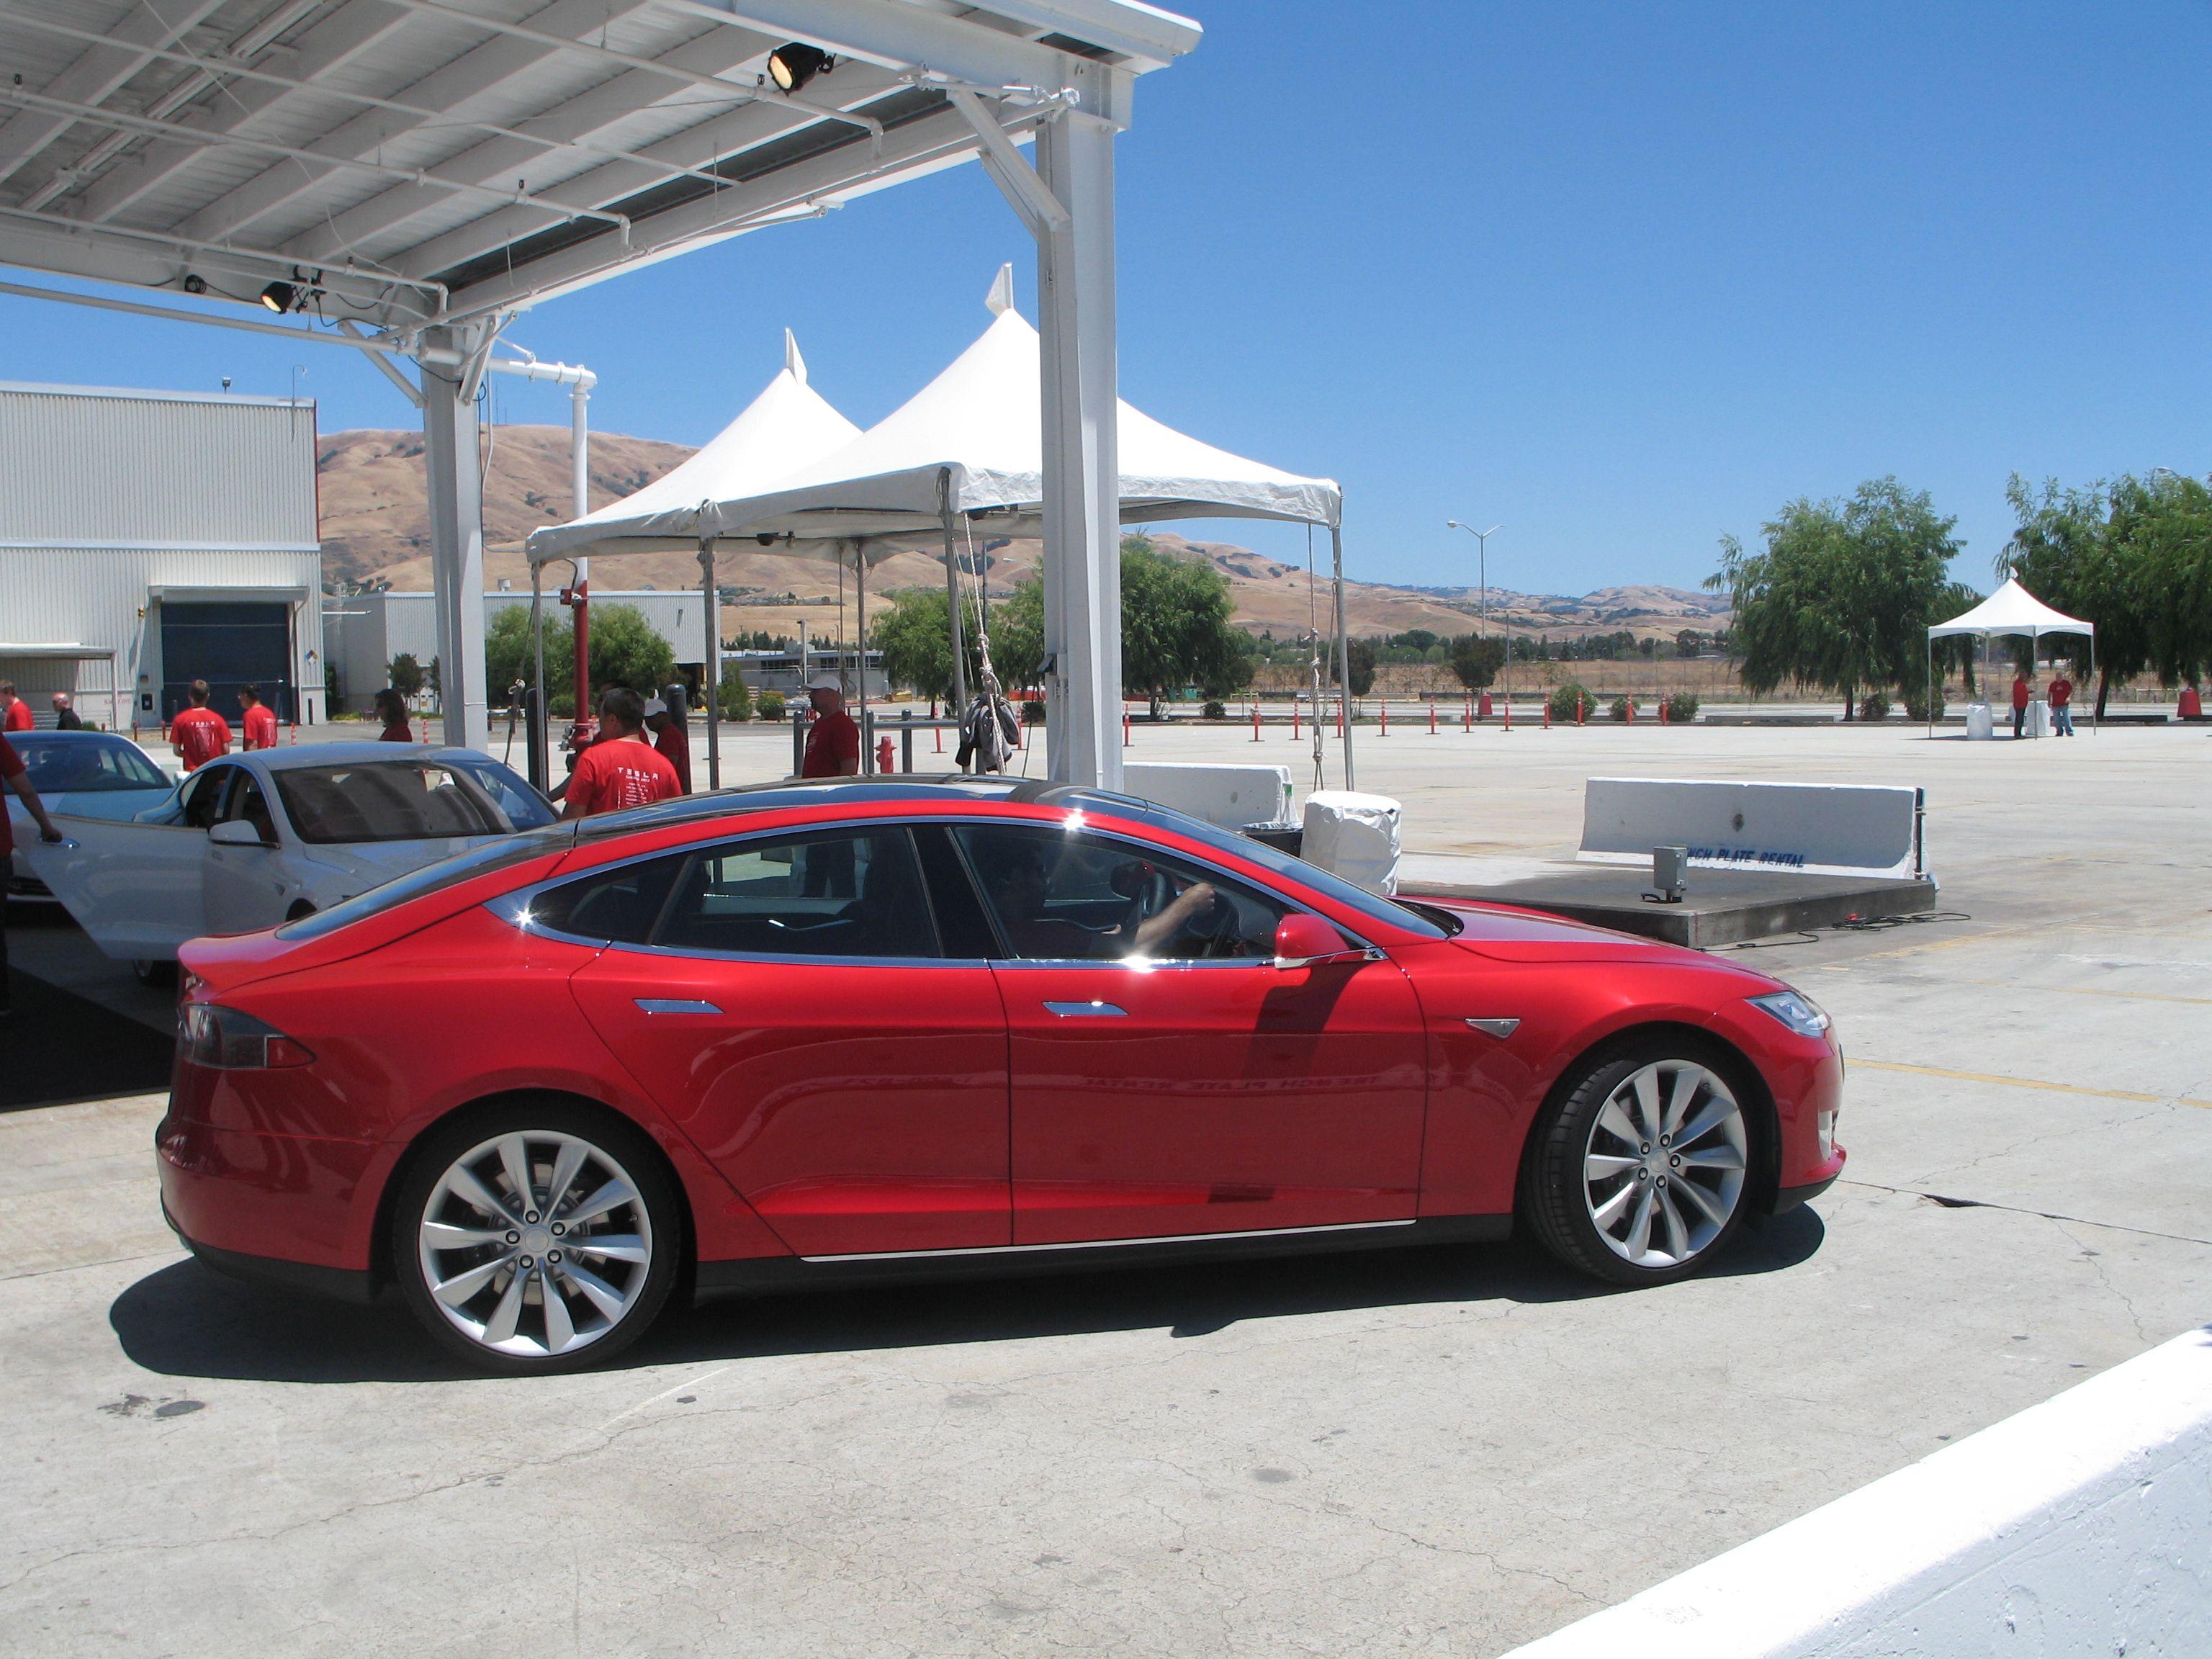 New Sunset Red Pics Forums Tesla Motors Tesla Model S Dream Cars Red Car